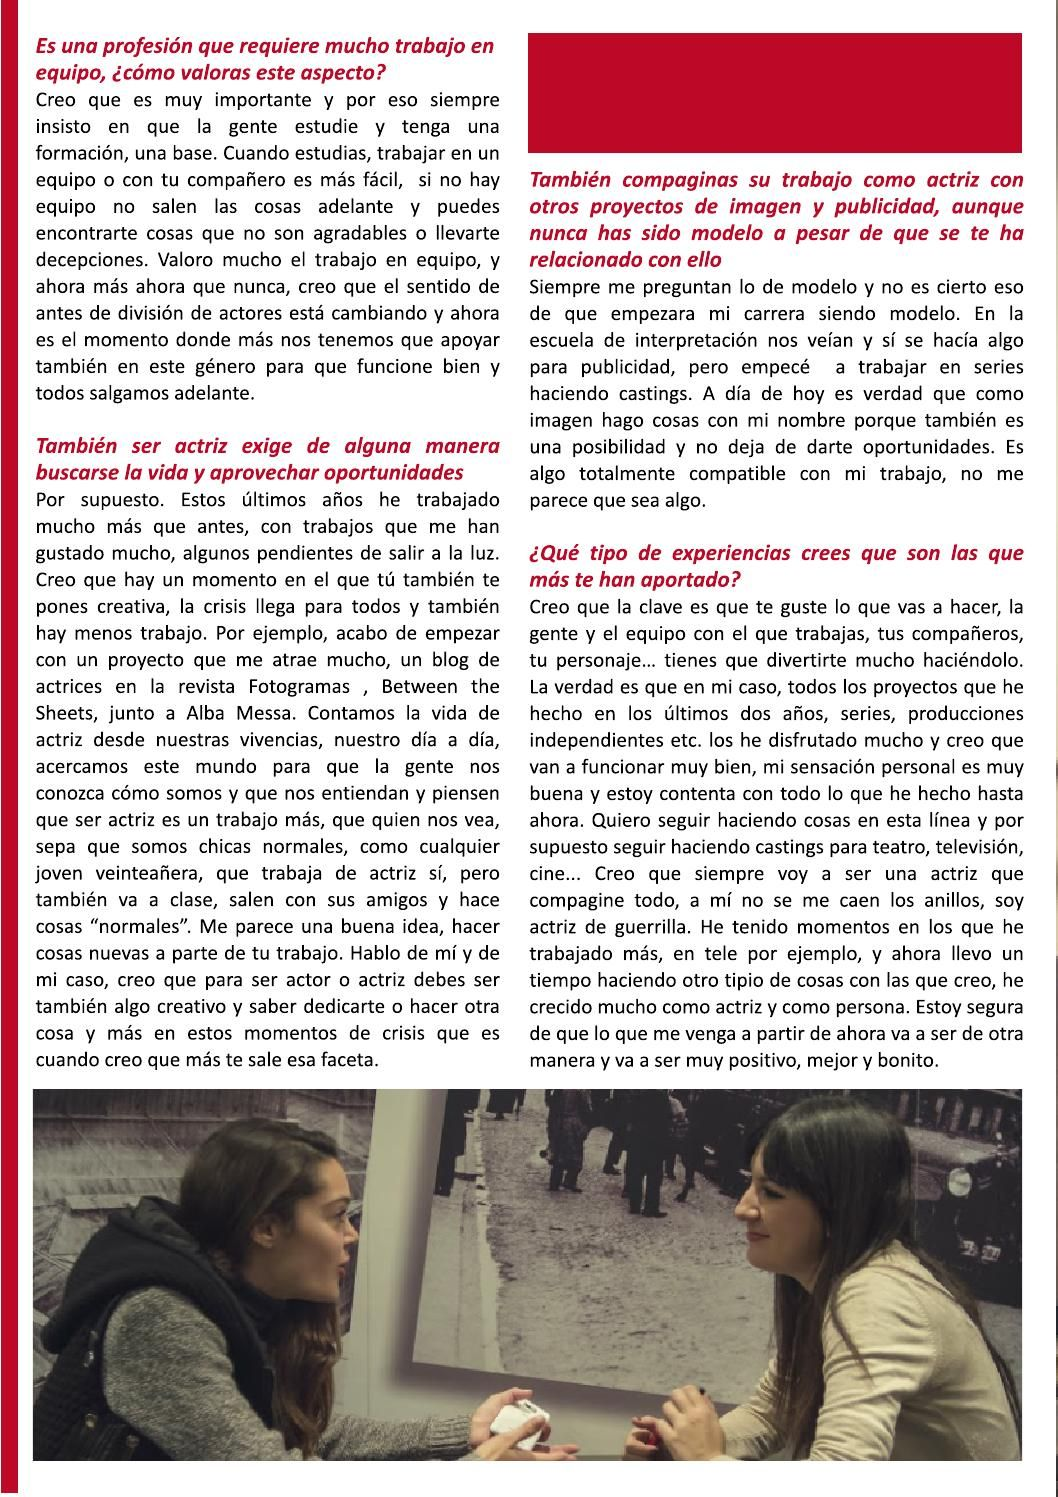 Pág 5 de la entrevista a Ana Rujas de Gaman Magazine#1 disponible en http://issuu.com/gamanmagazine/docs/n1_gamanfinal